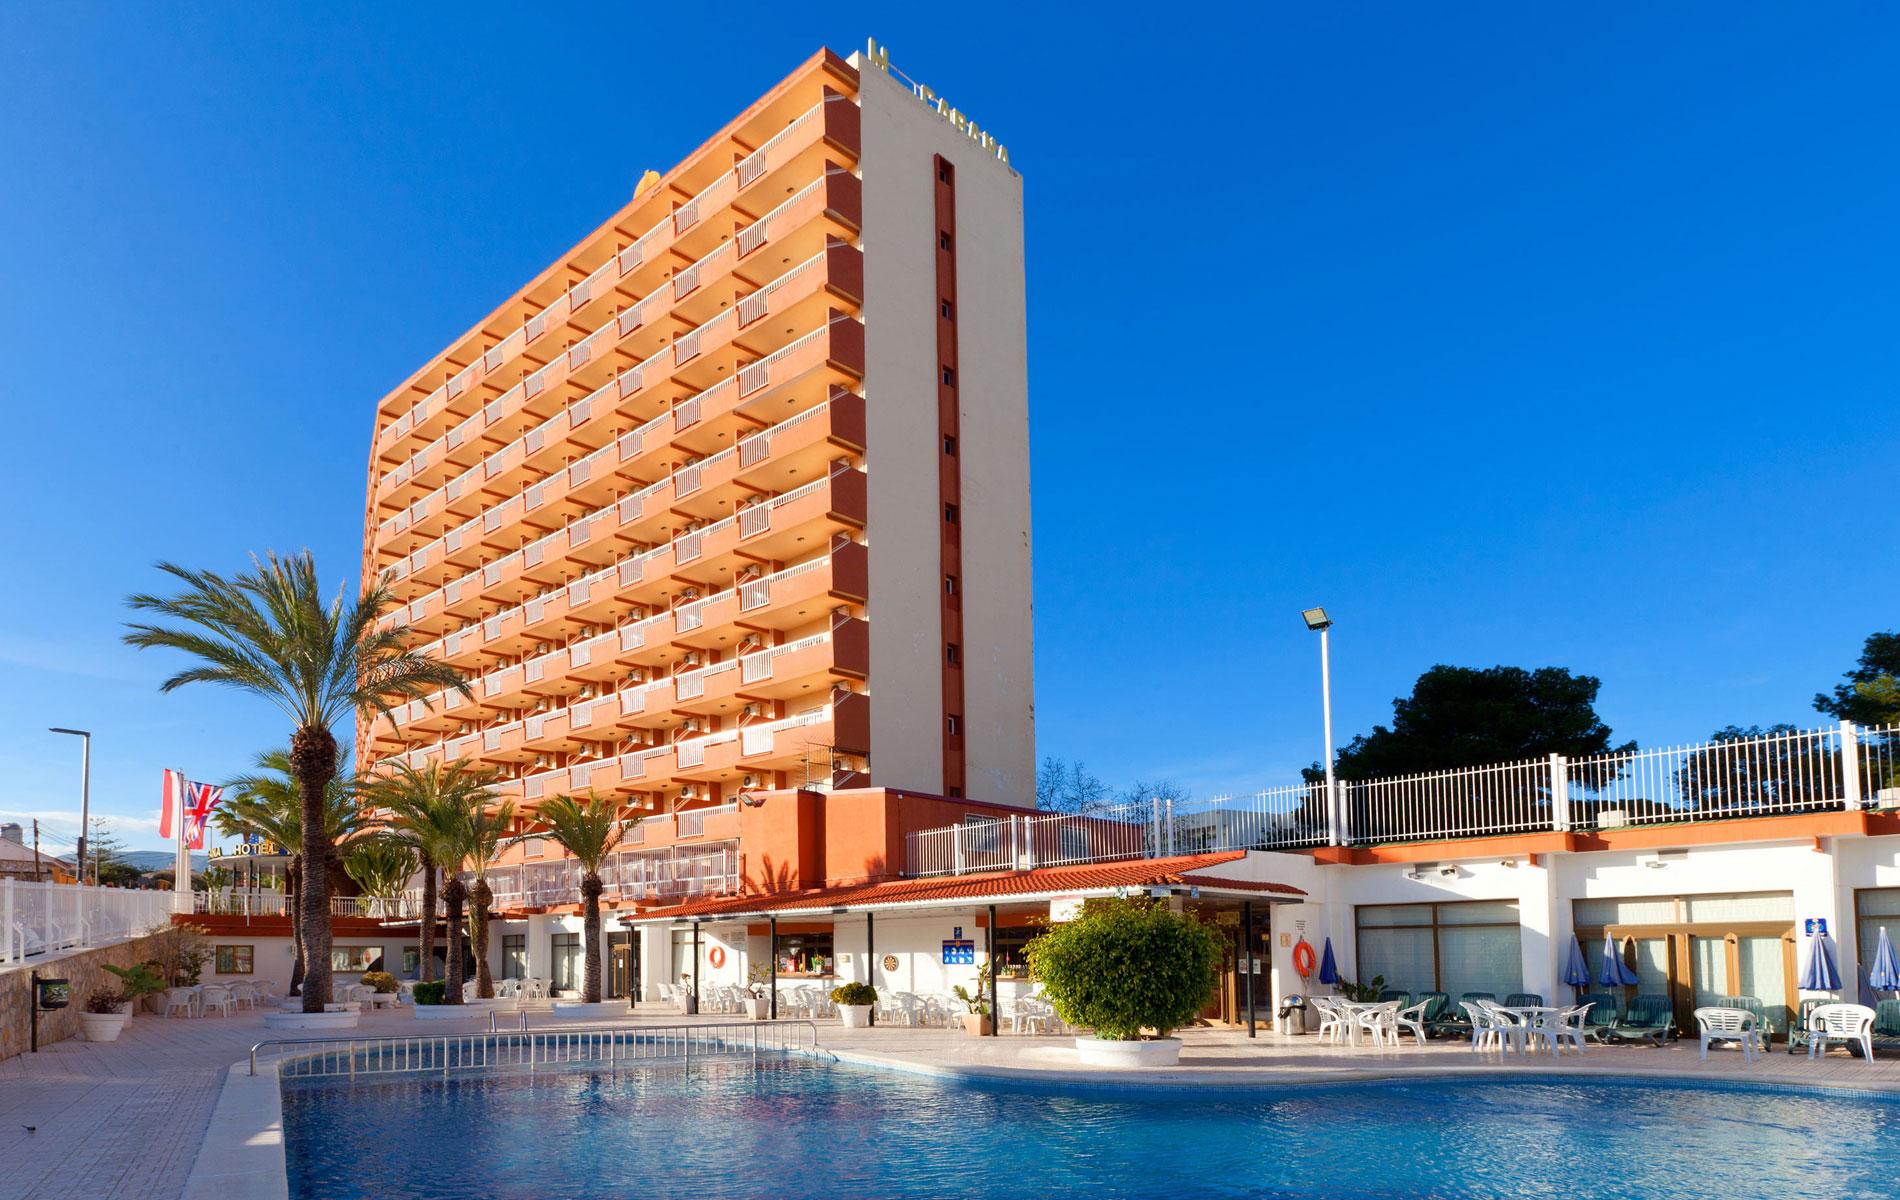 Cabana hotel 9 nap 7 j last minute wizzair - Hotel asiatico benidorm ...